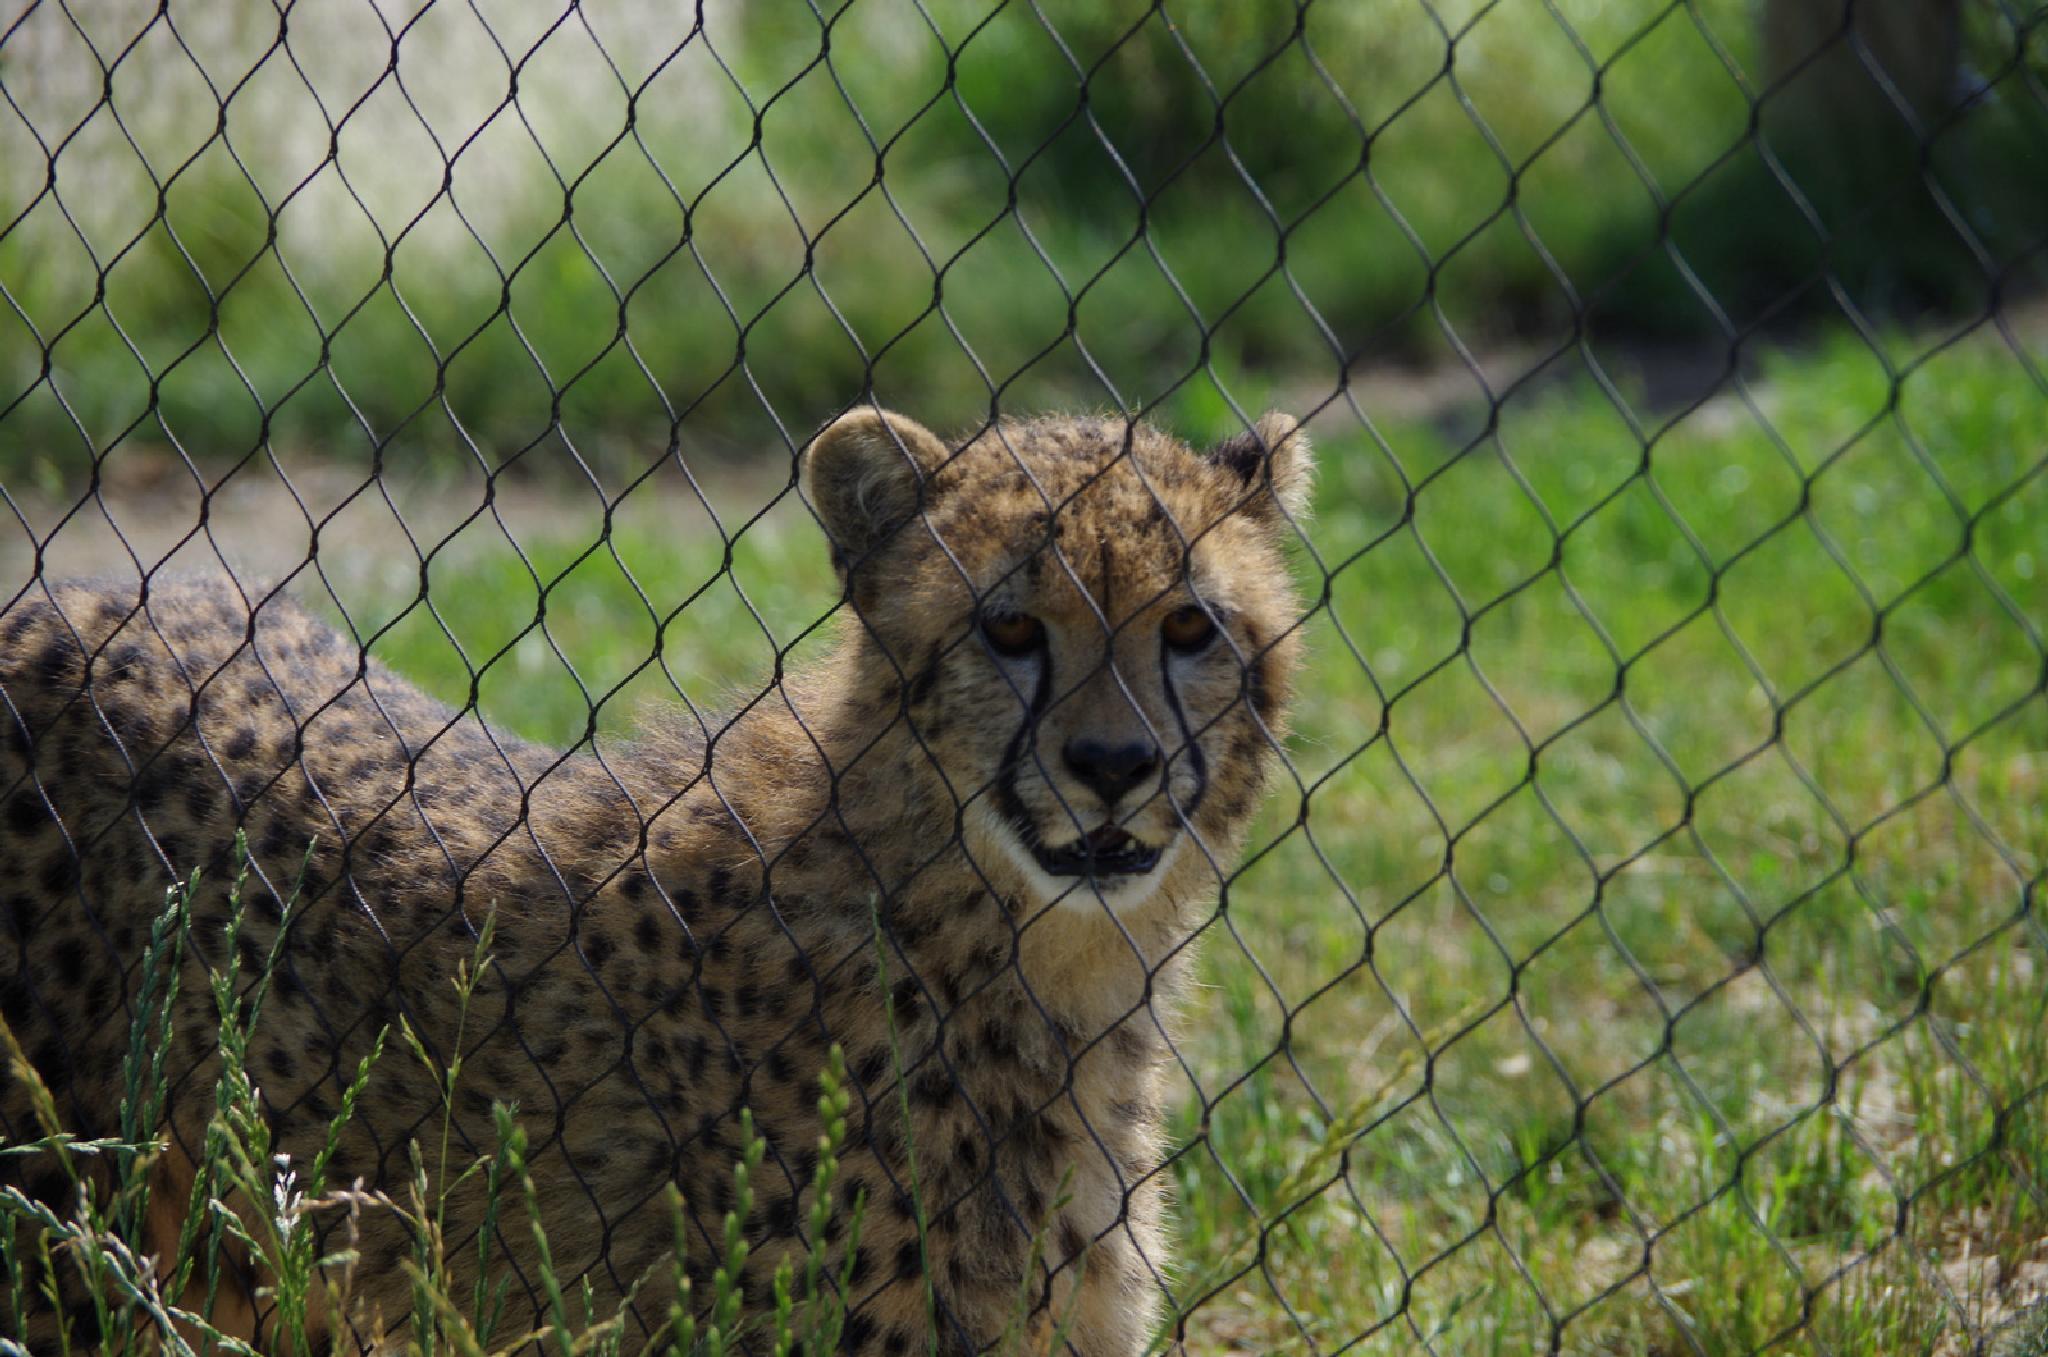 Cheetah by david.lowe.3532507